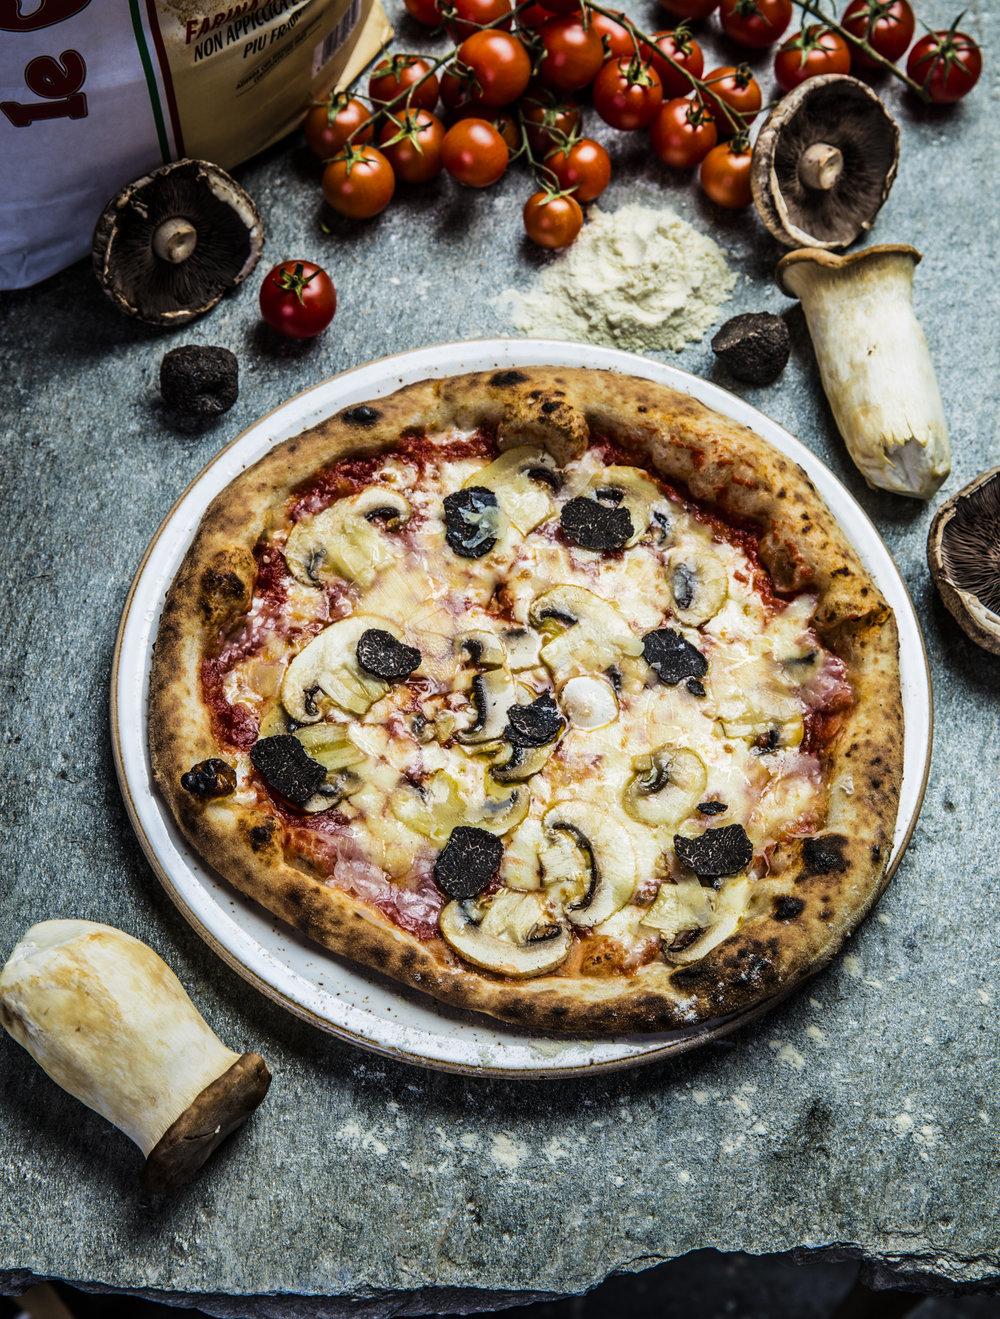 paleet-pizza-høst-7390.jpg